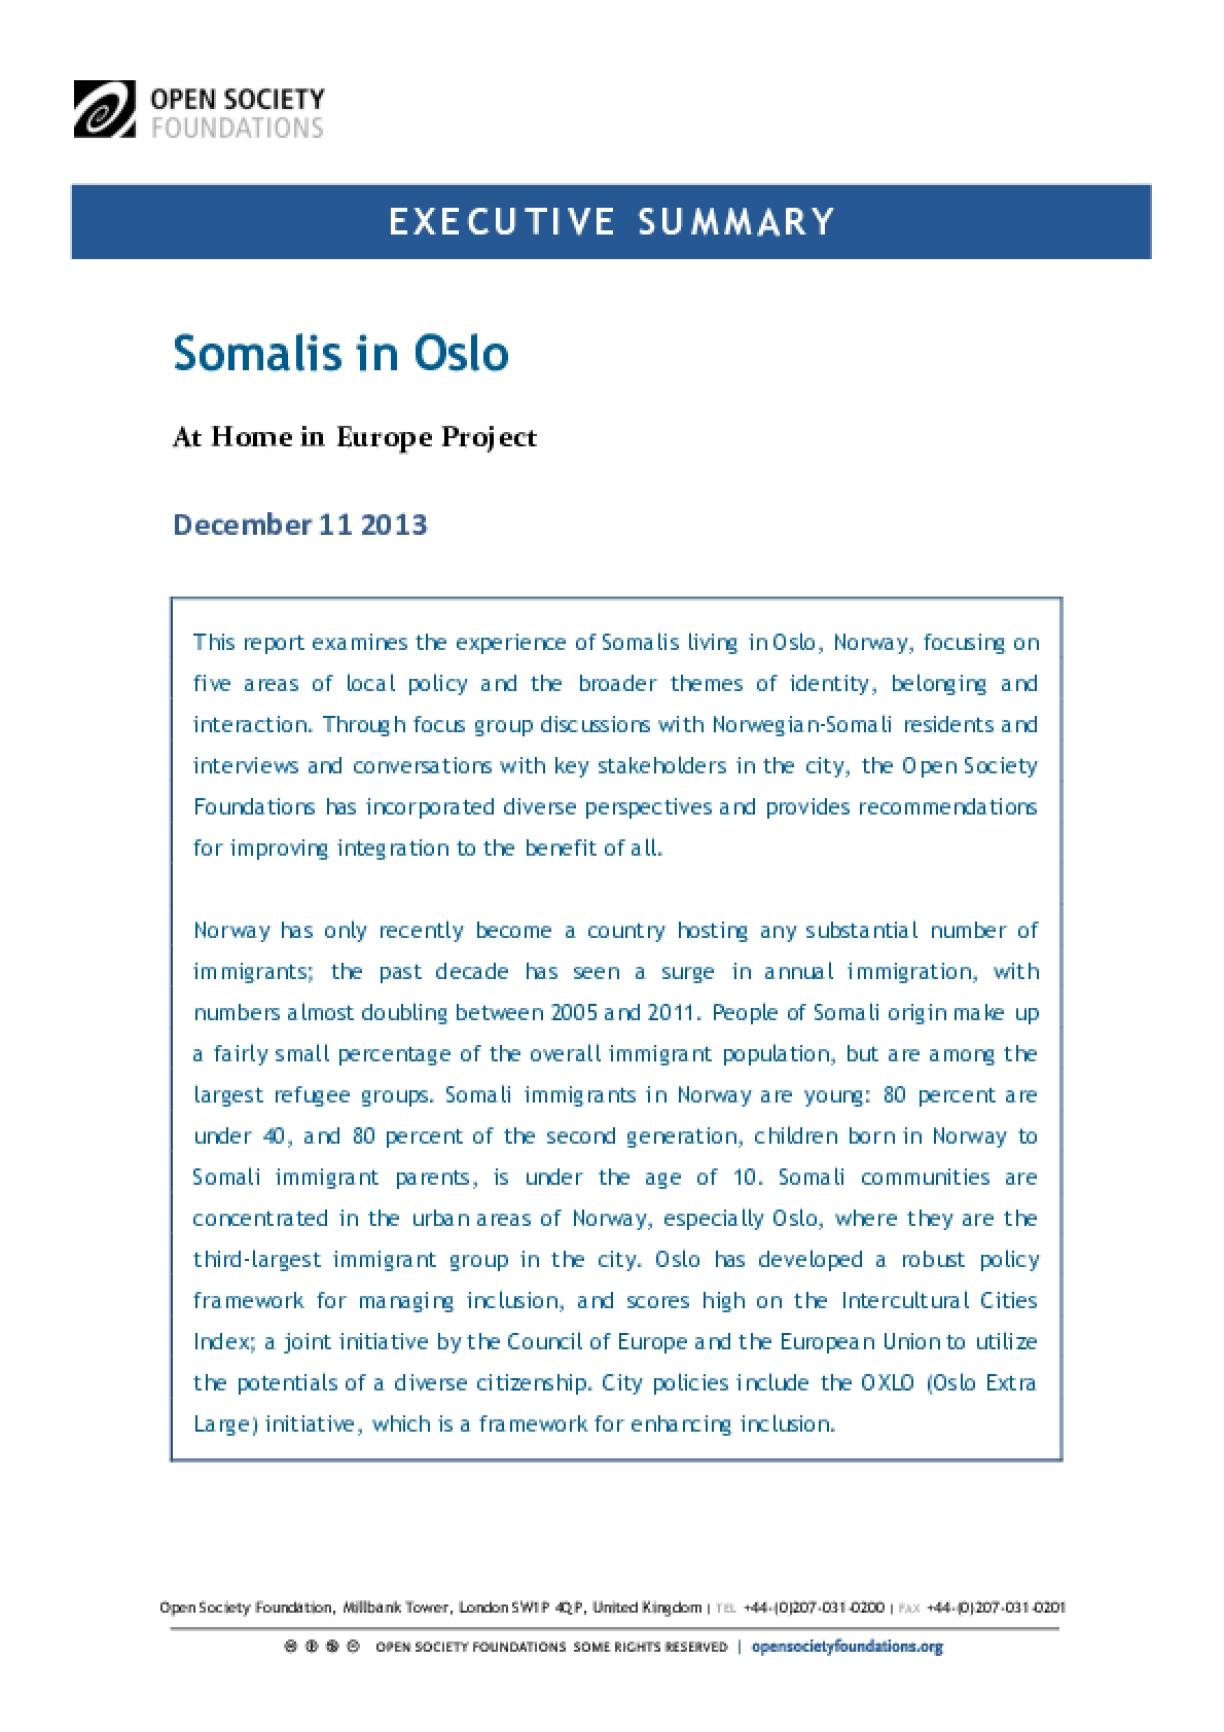 Somalis in Oslo: Executive Summary